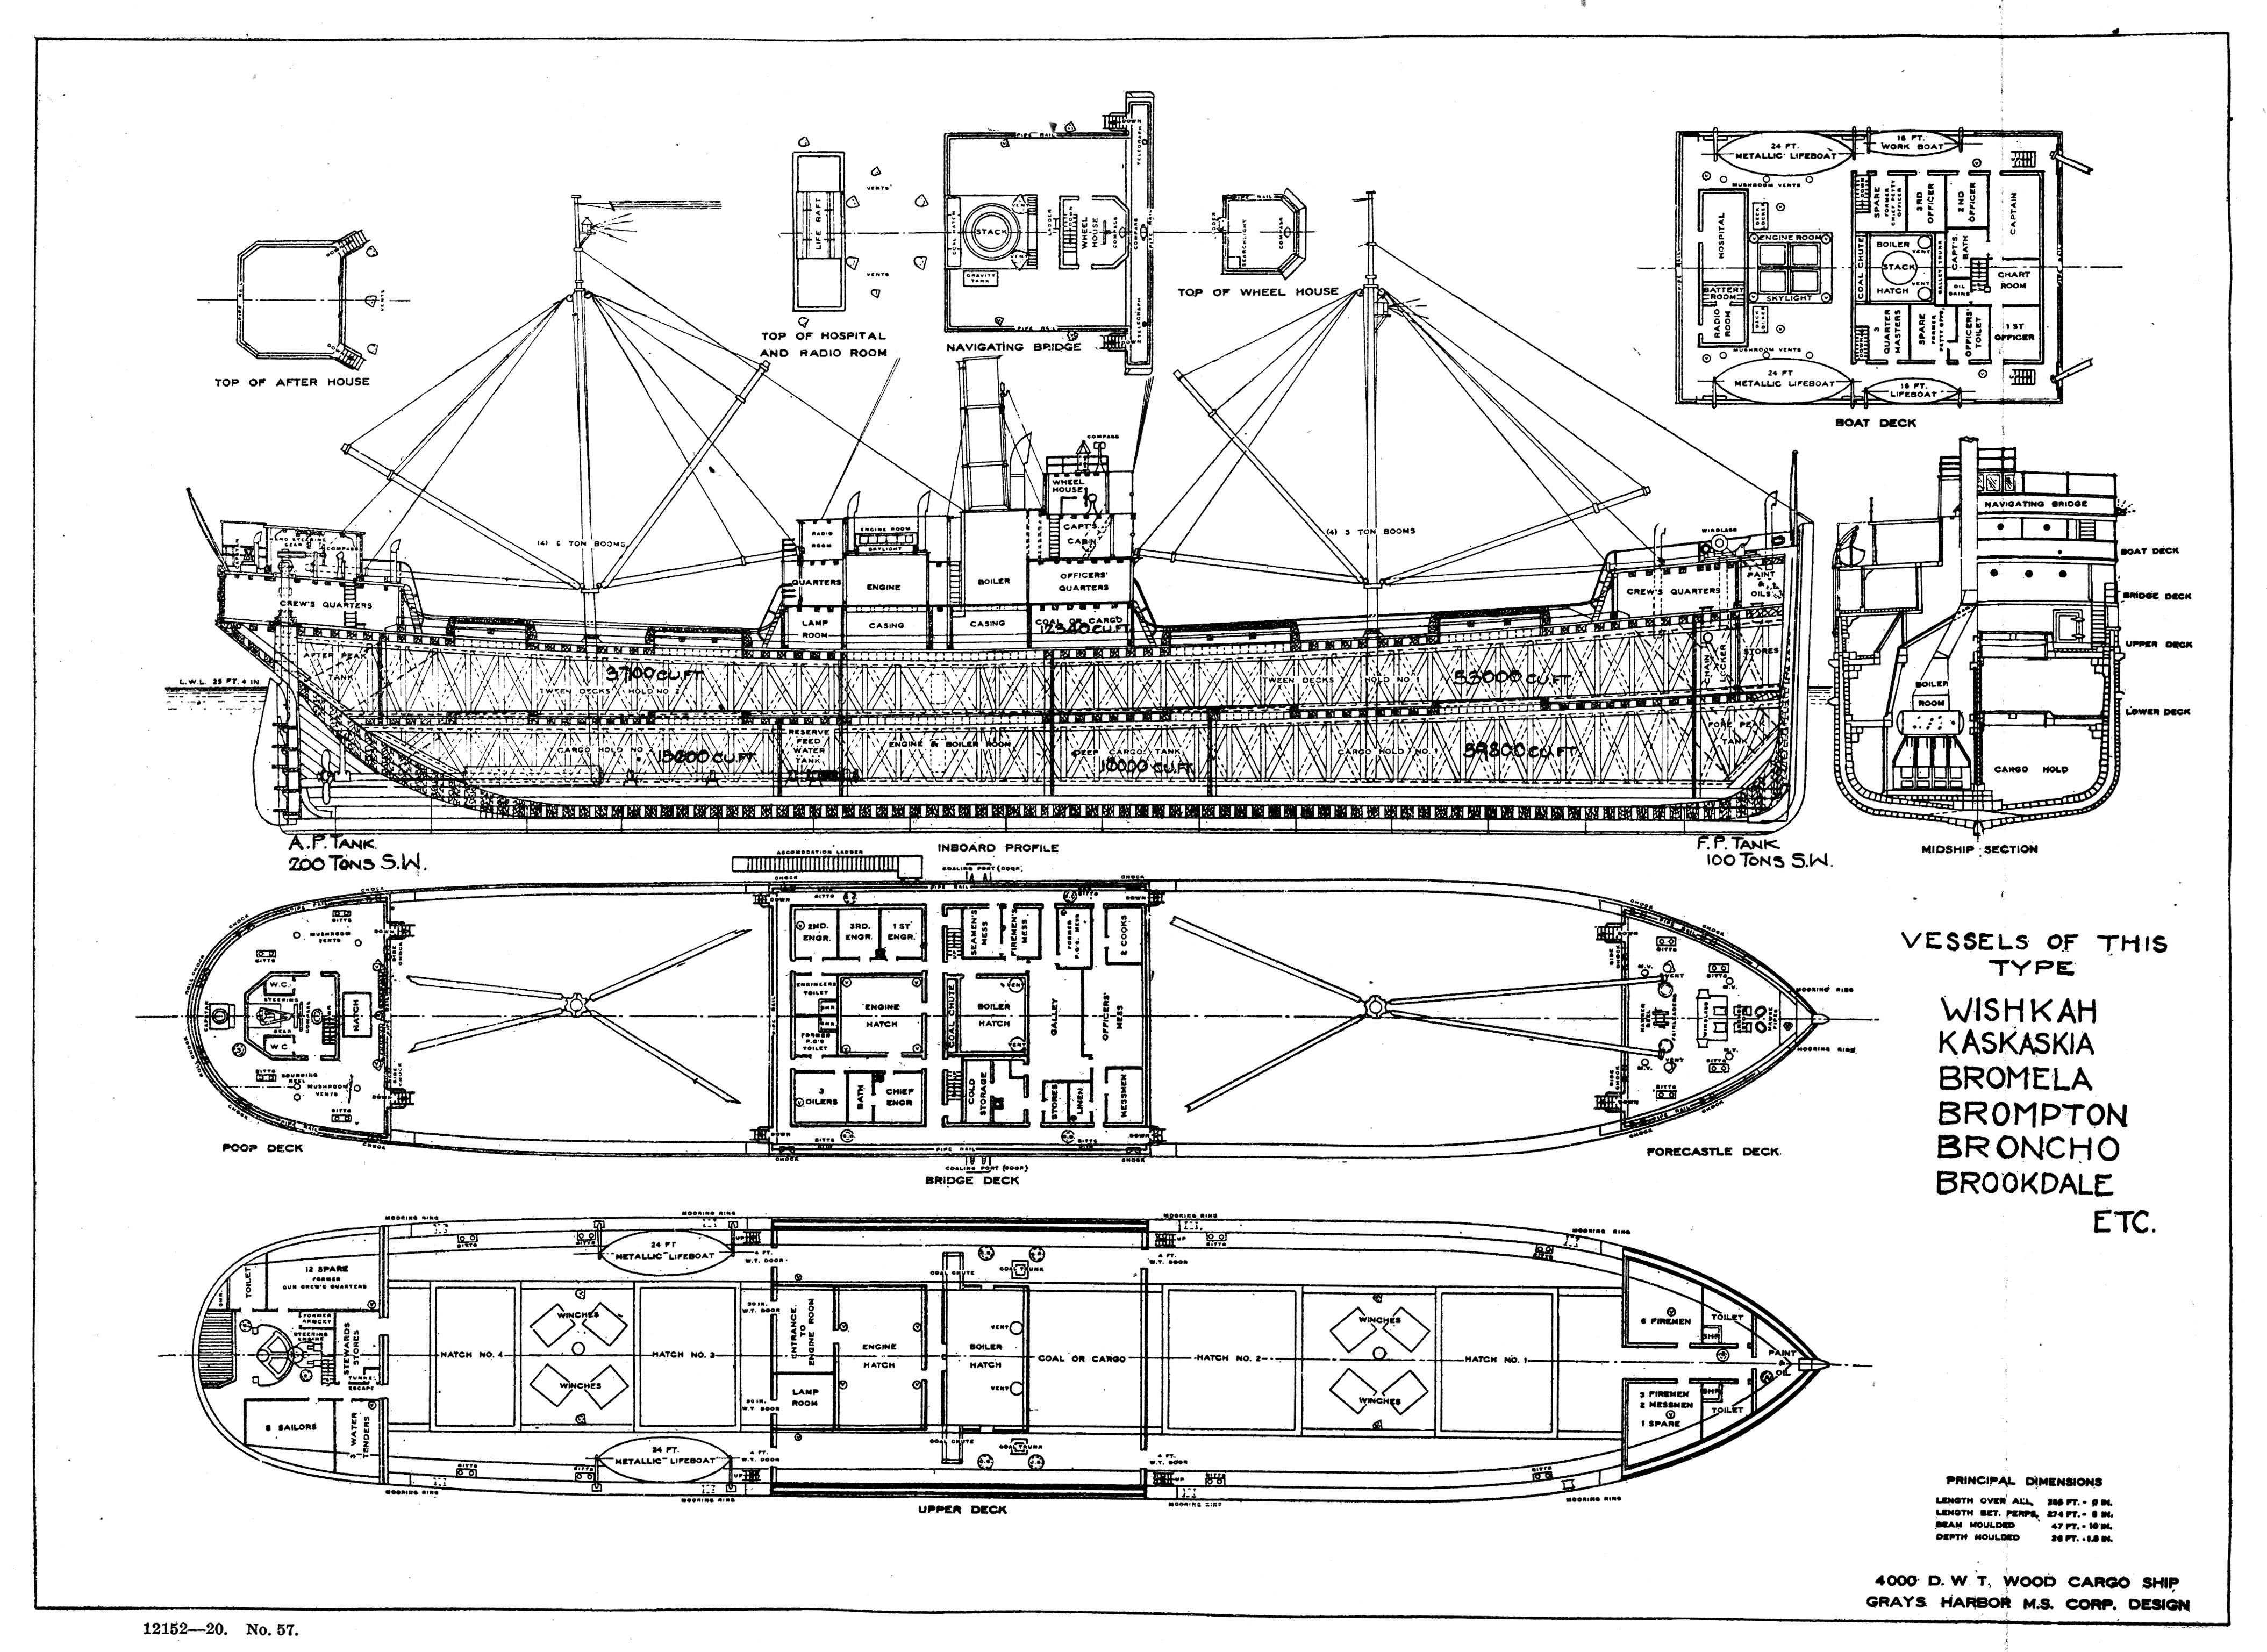 Ussb Ship Register August 1 Plan 57